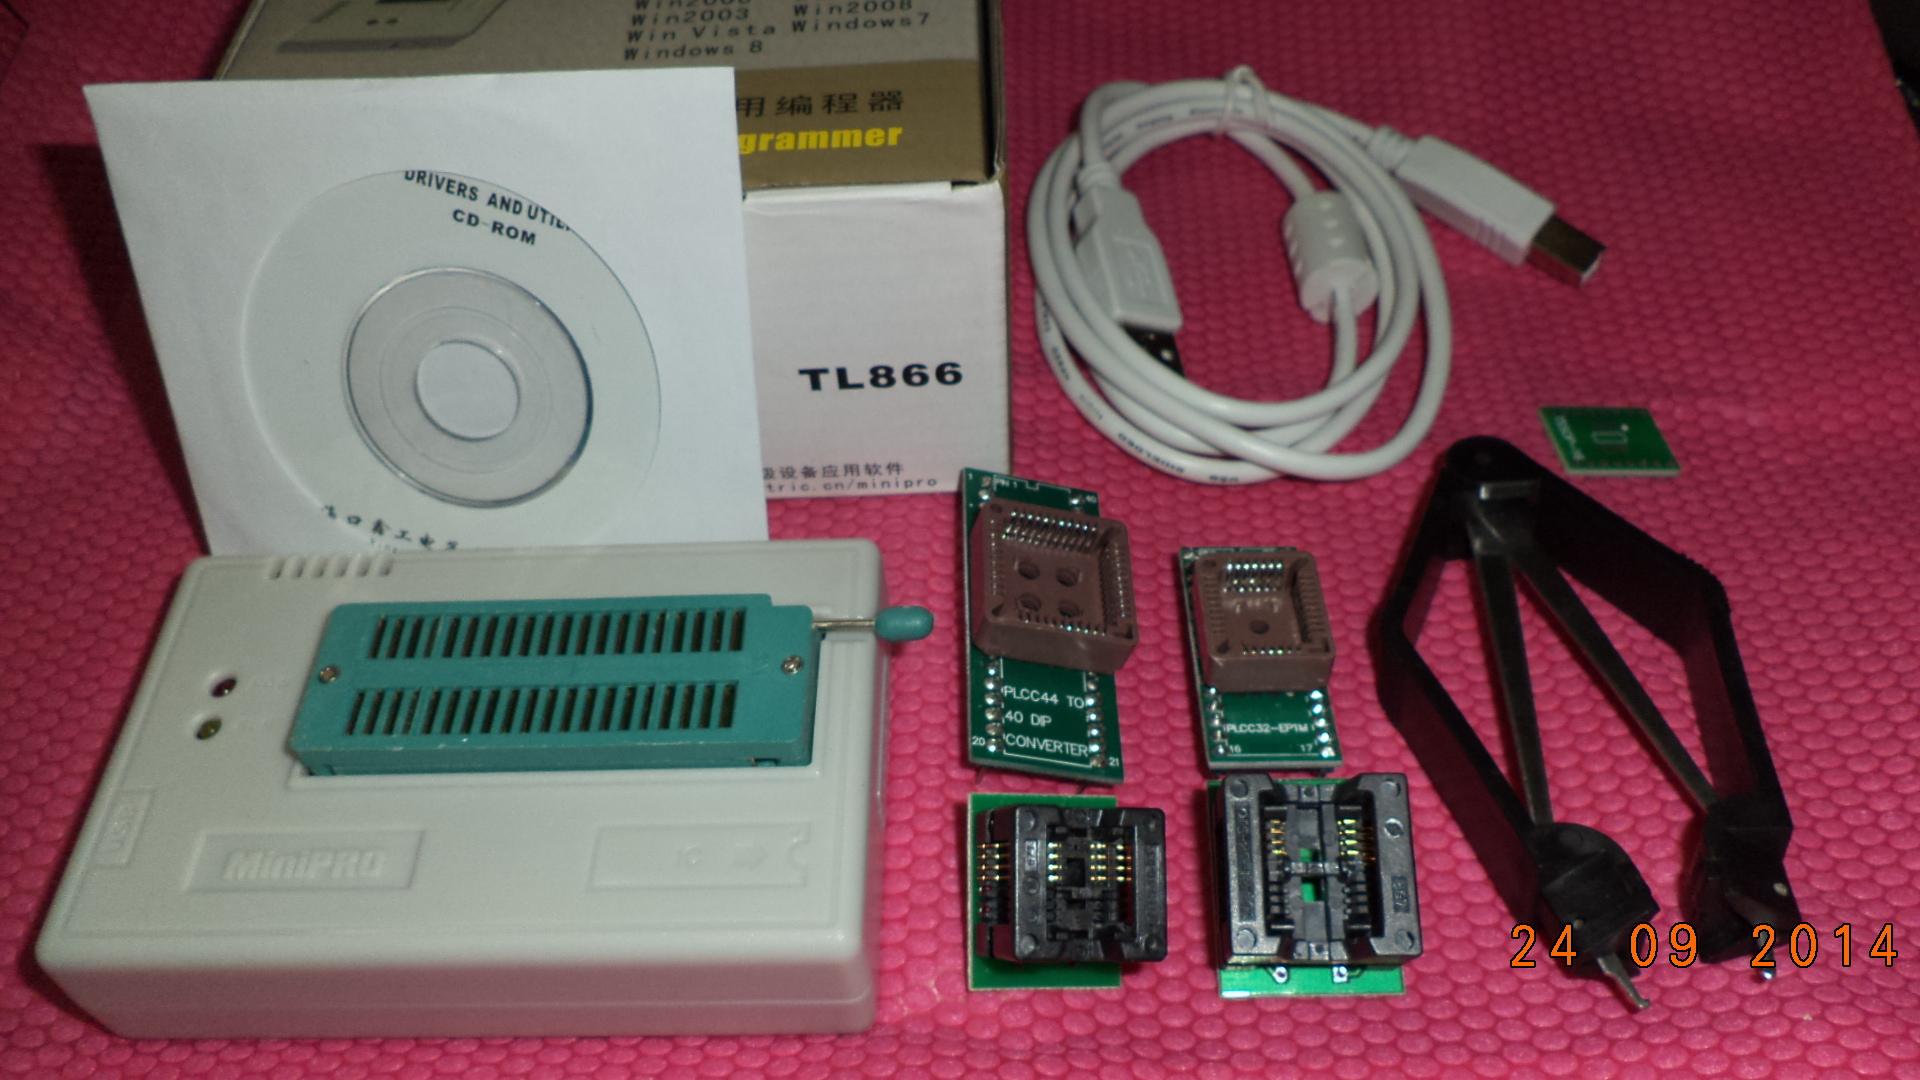 ALAT COPY IC MEMORY/EEPROM/SPI FLASH UNTUK LCD/LED/TV.DVD.BIOS LAPTOP.MICROCONTROLLER.ECU MOBIL 4242426_e8c3594d-9e9f-44f7-a3db-c2f6f93a1d72